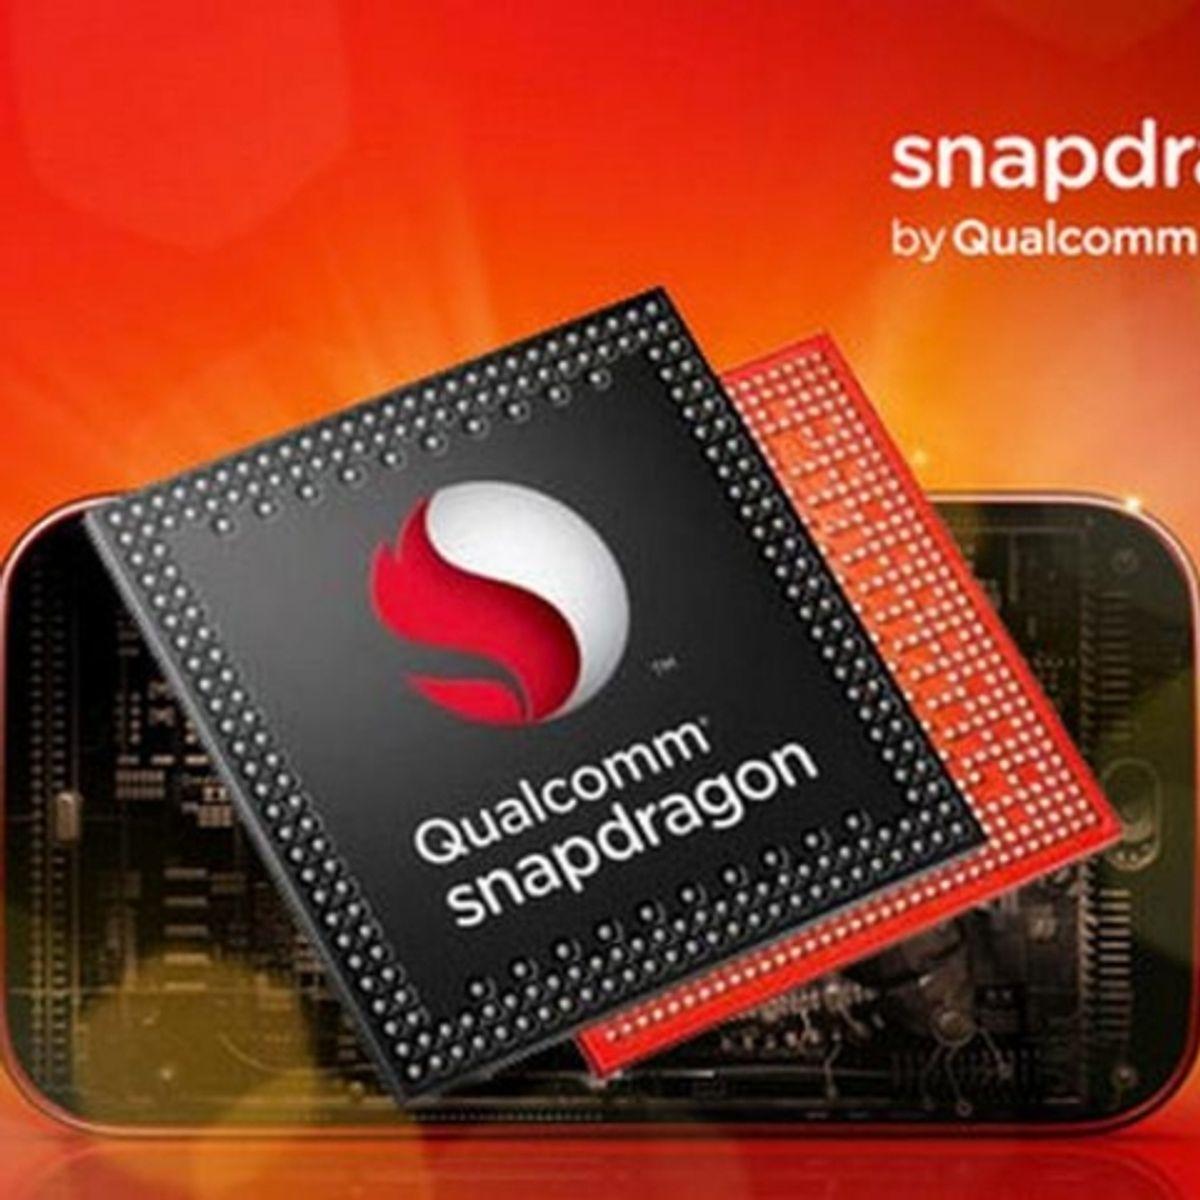 Qualcomm Snapdragon 820 specs leaked, will sport custom